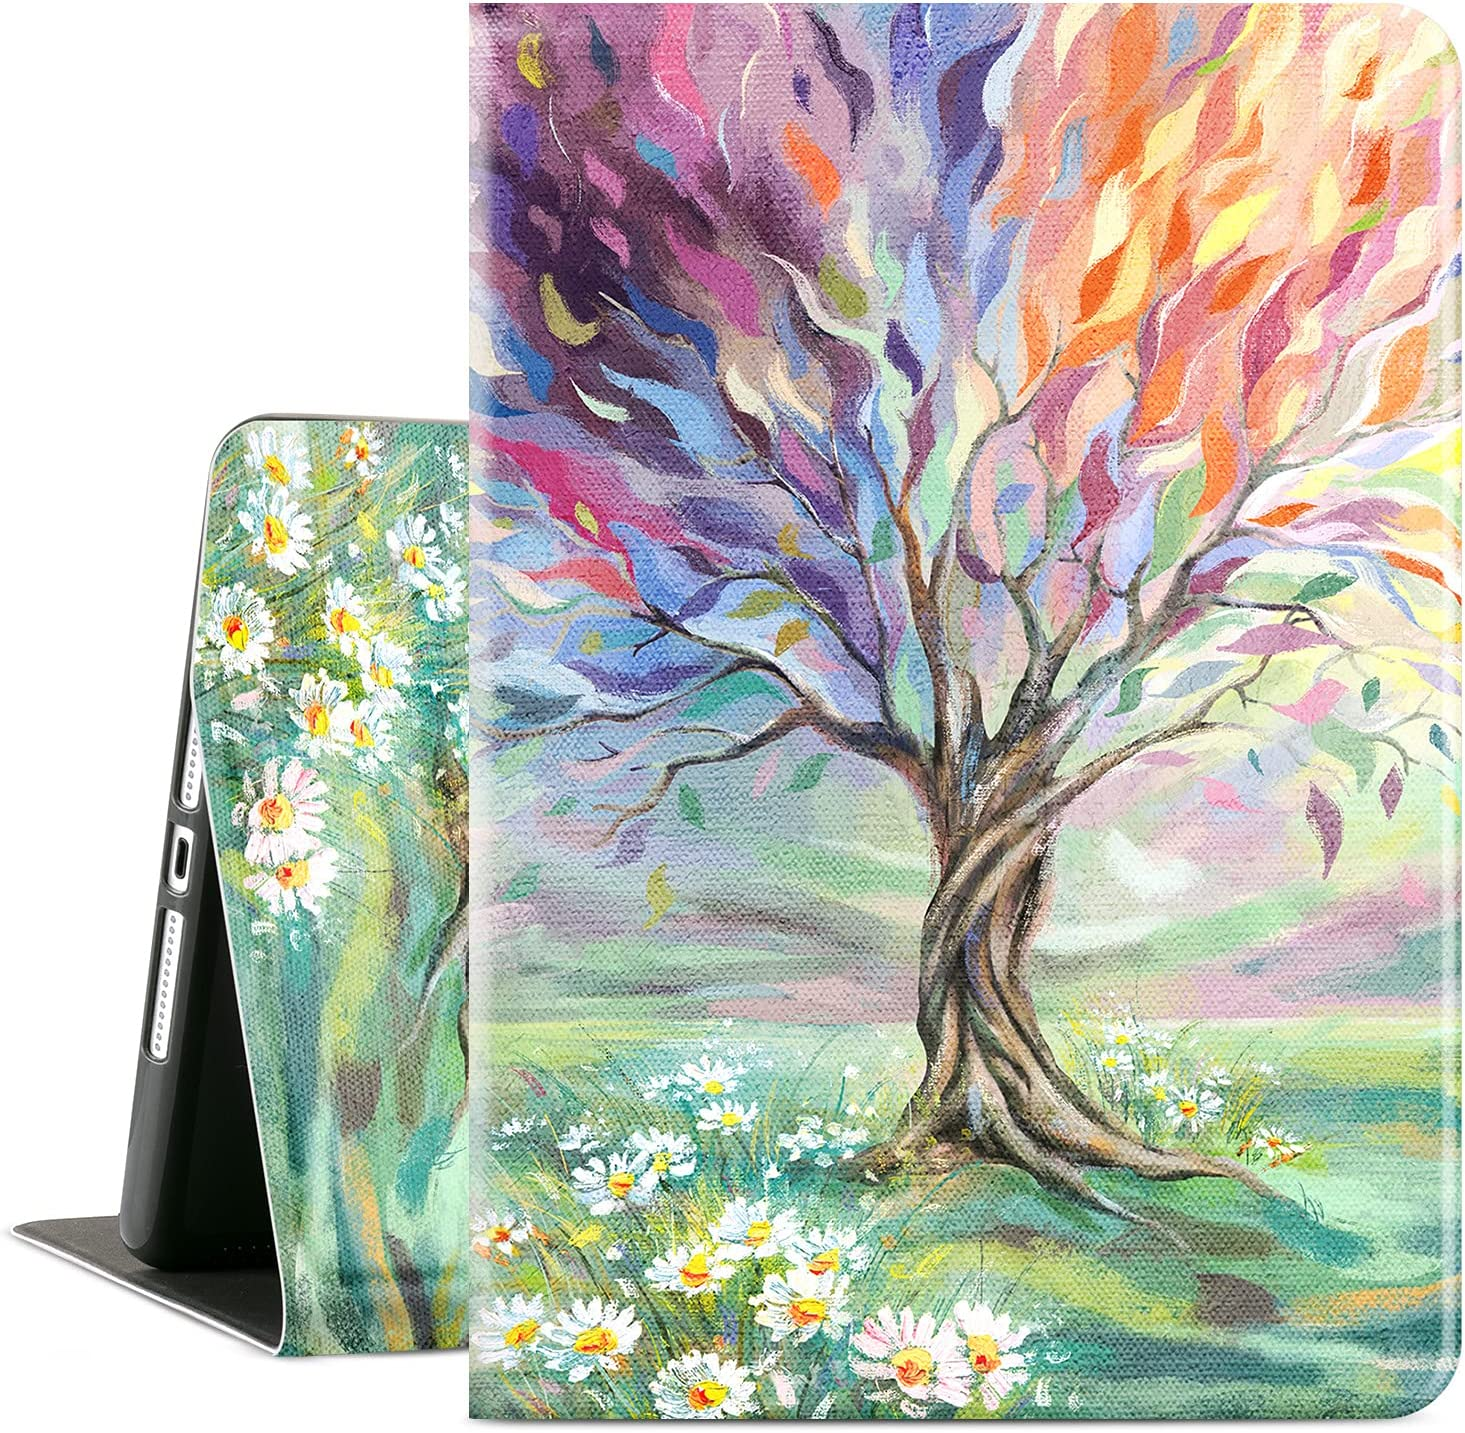 Cutebricase iPad 10.2 Case for iPad 8th Generation 2020, iPad 7th Generation Case 10.2 Inch iPad Case Multi-Angle View Adjustable Stand Soft PU Inner Back Auto Wake/Sleep(Oil Painting Tree)